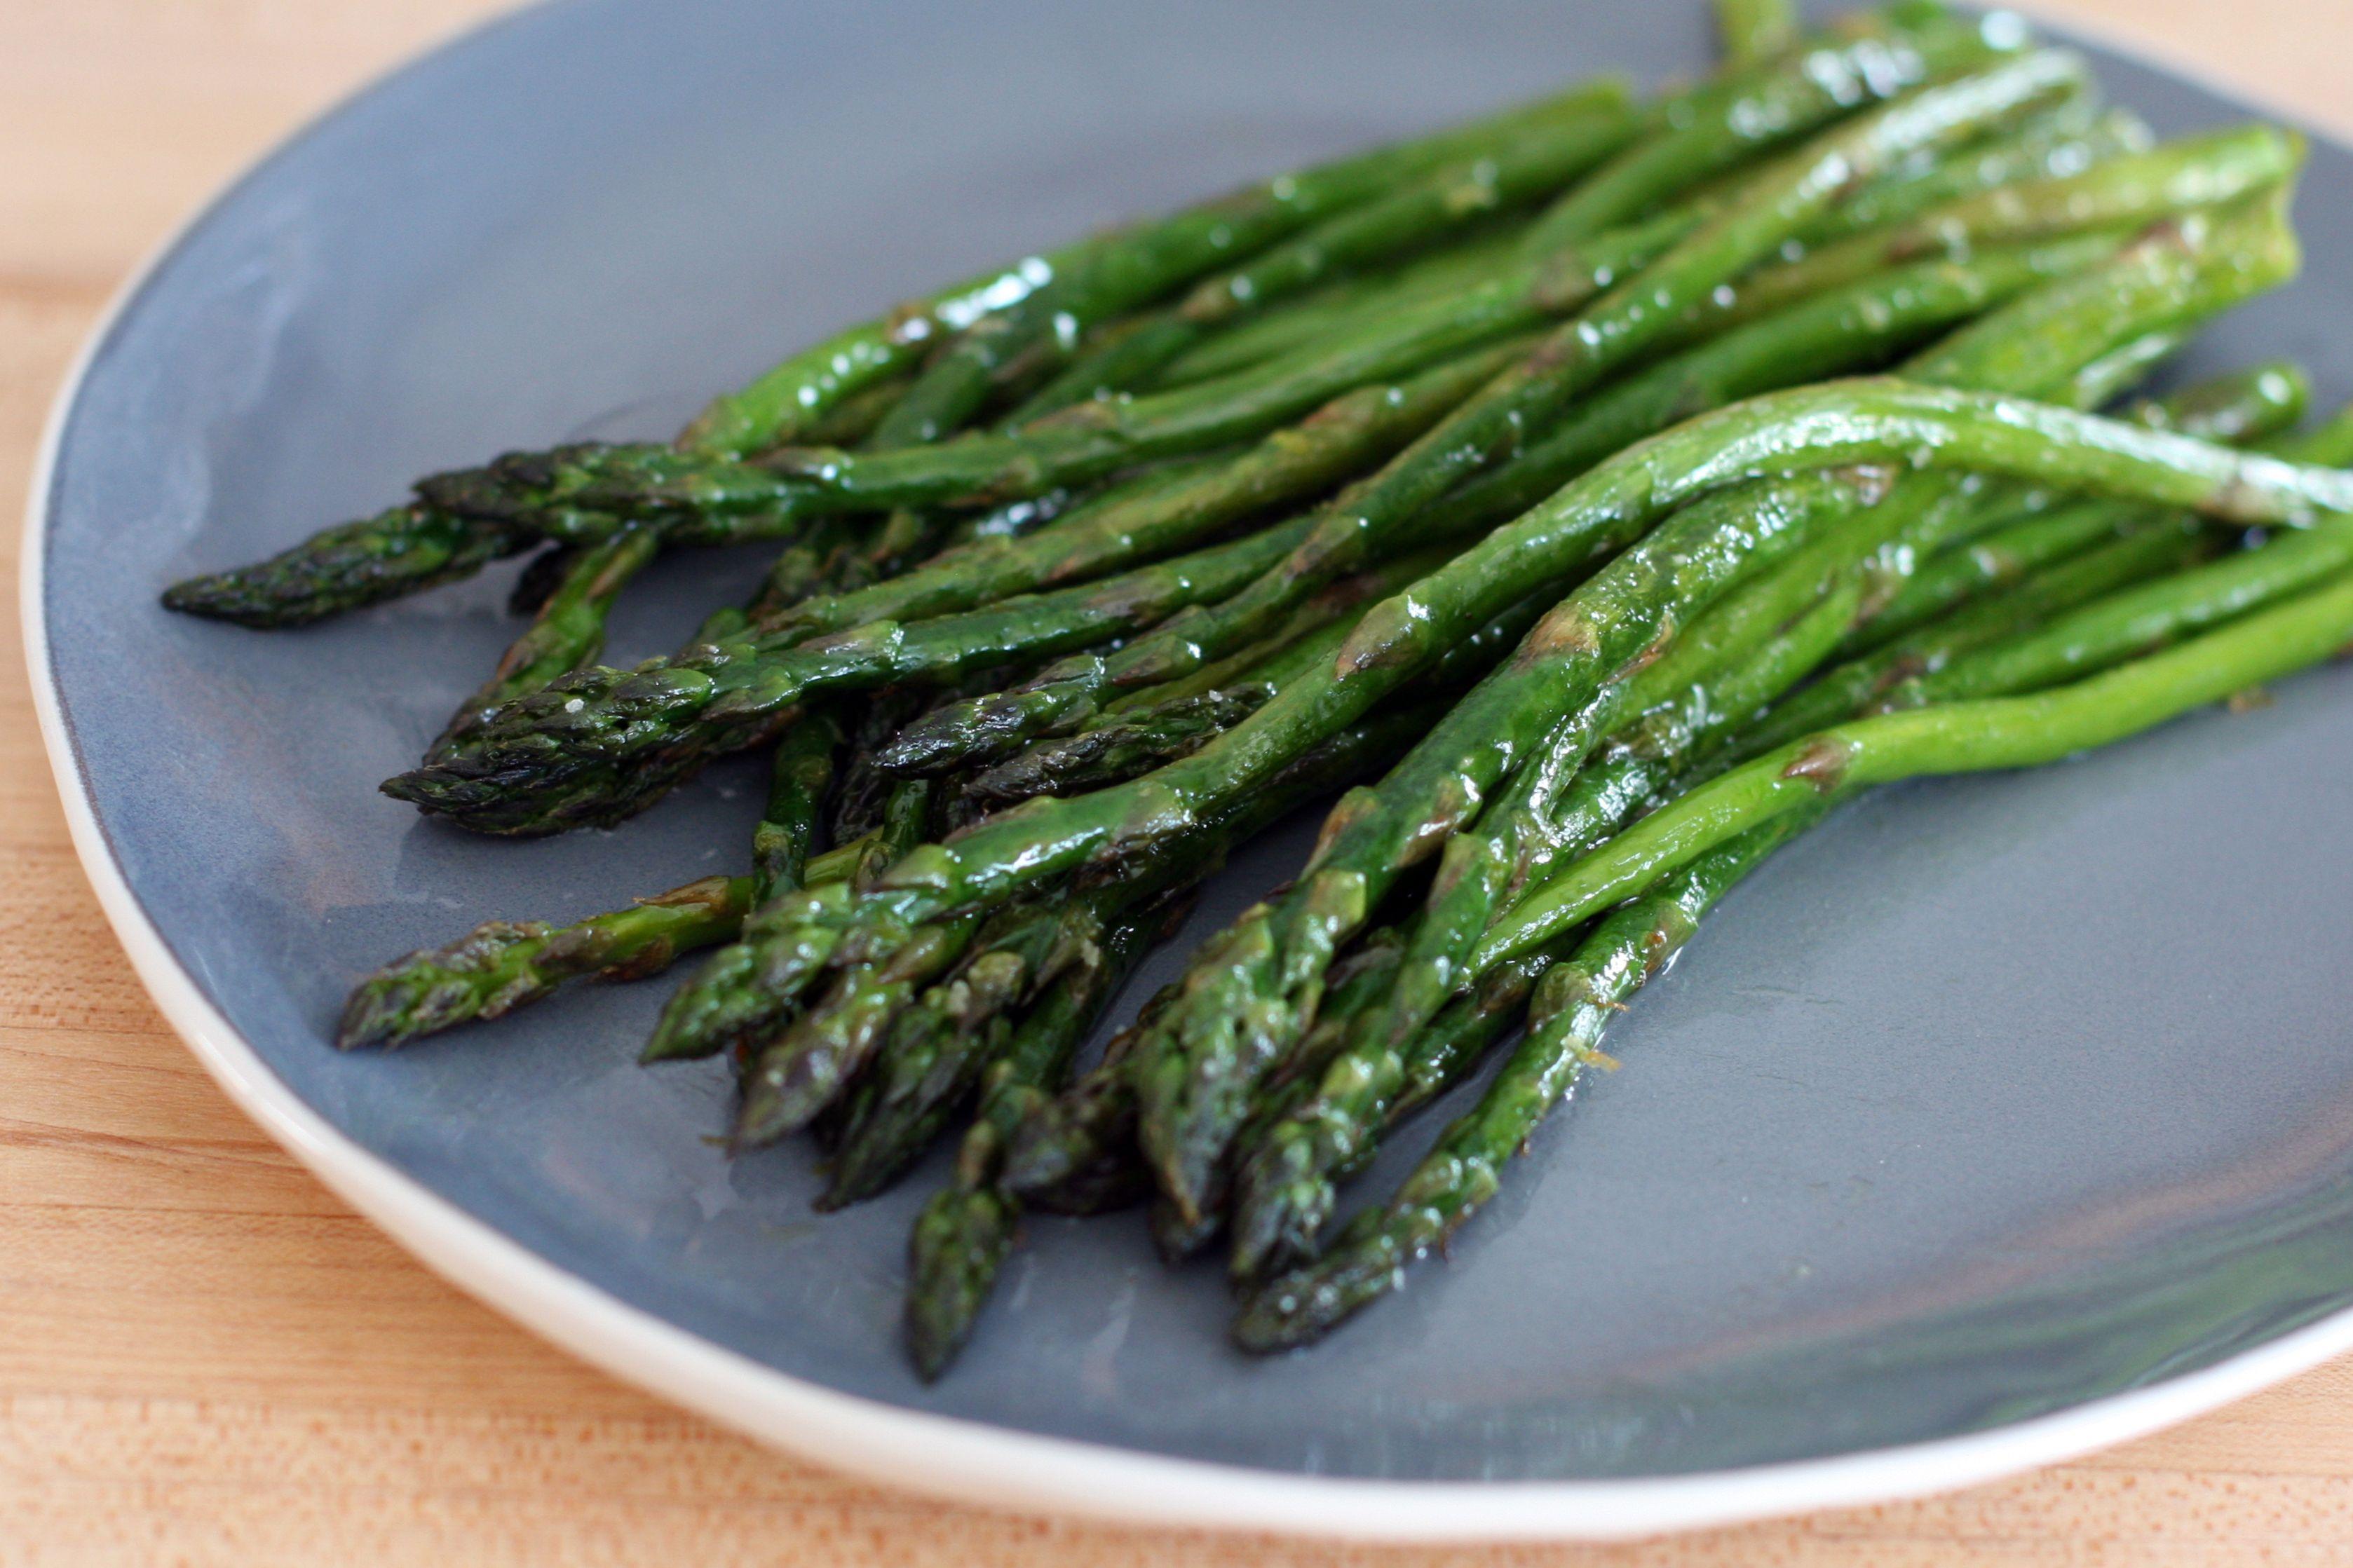 10-Minute Roasted Asparagus